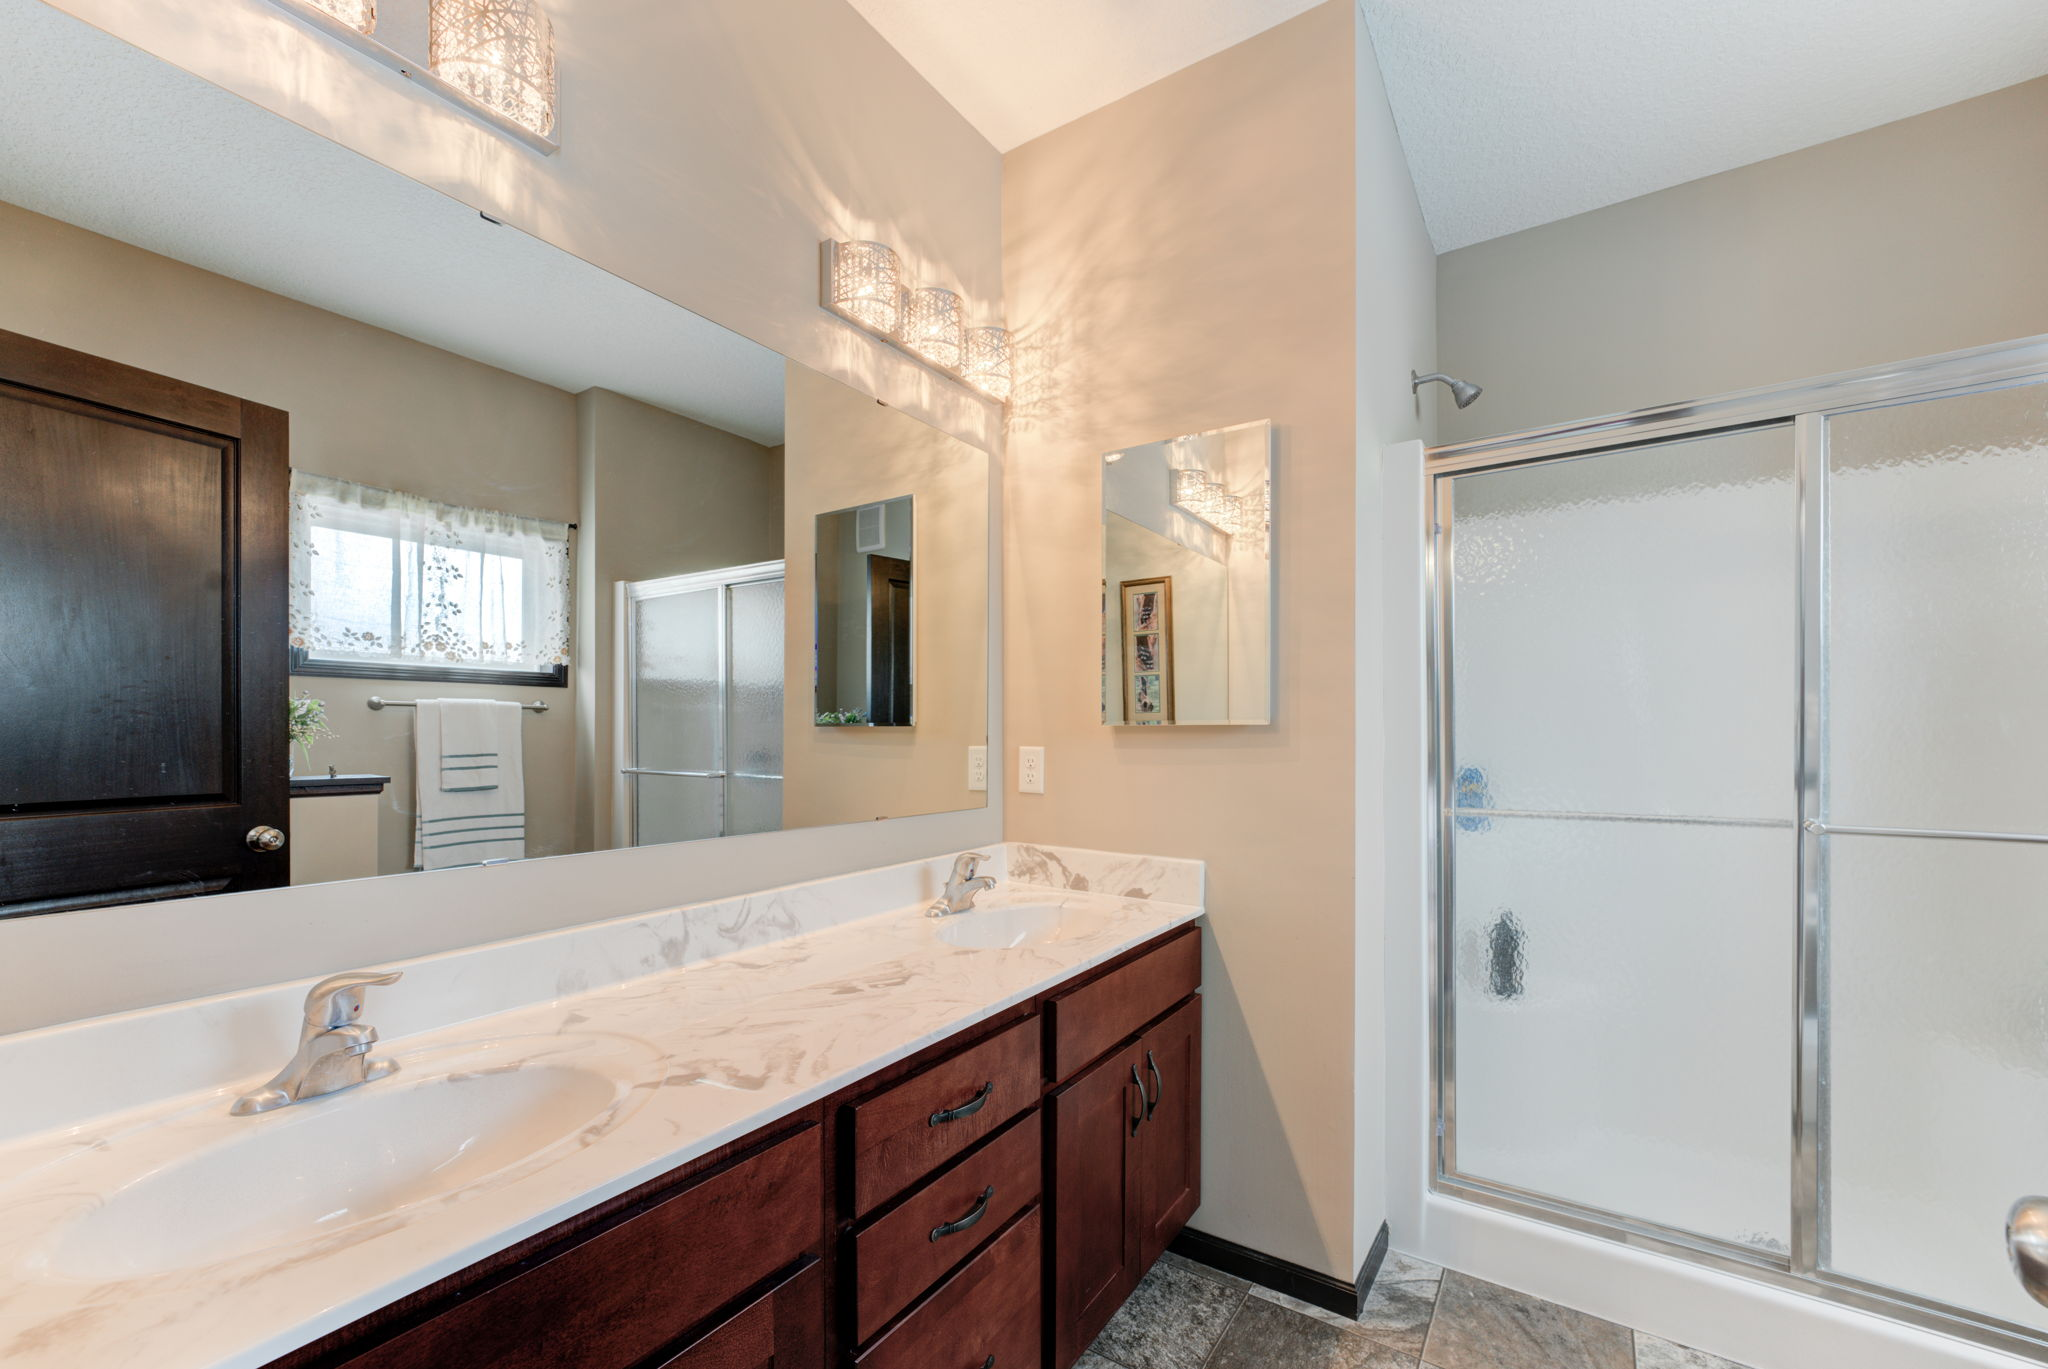 Master Bath with twin sinked vanity